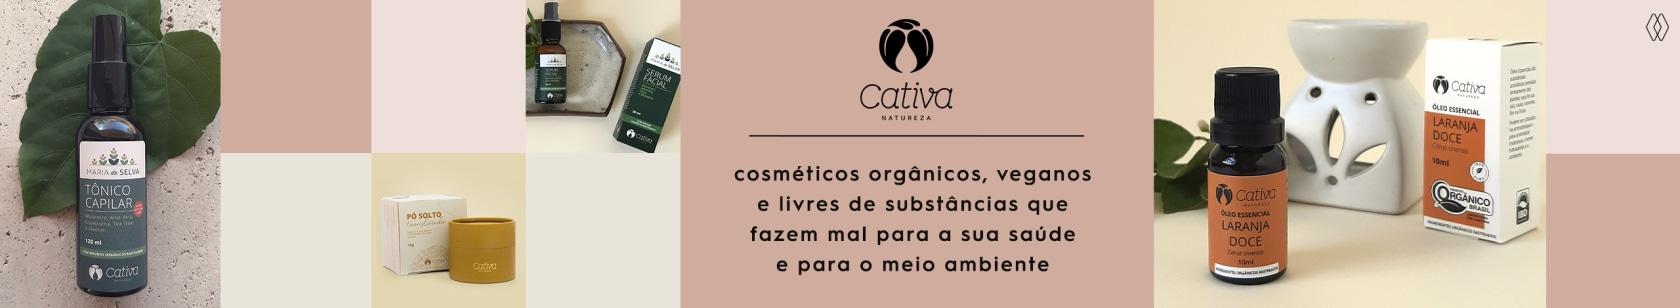 CATIVA NATUREZA | AMARO